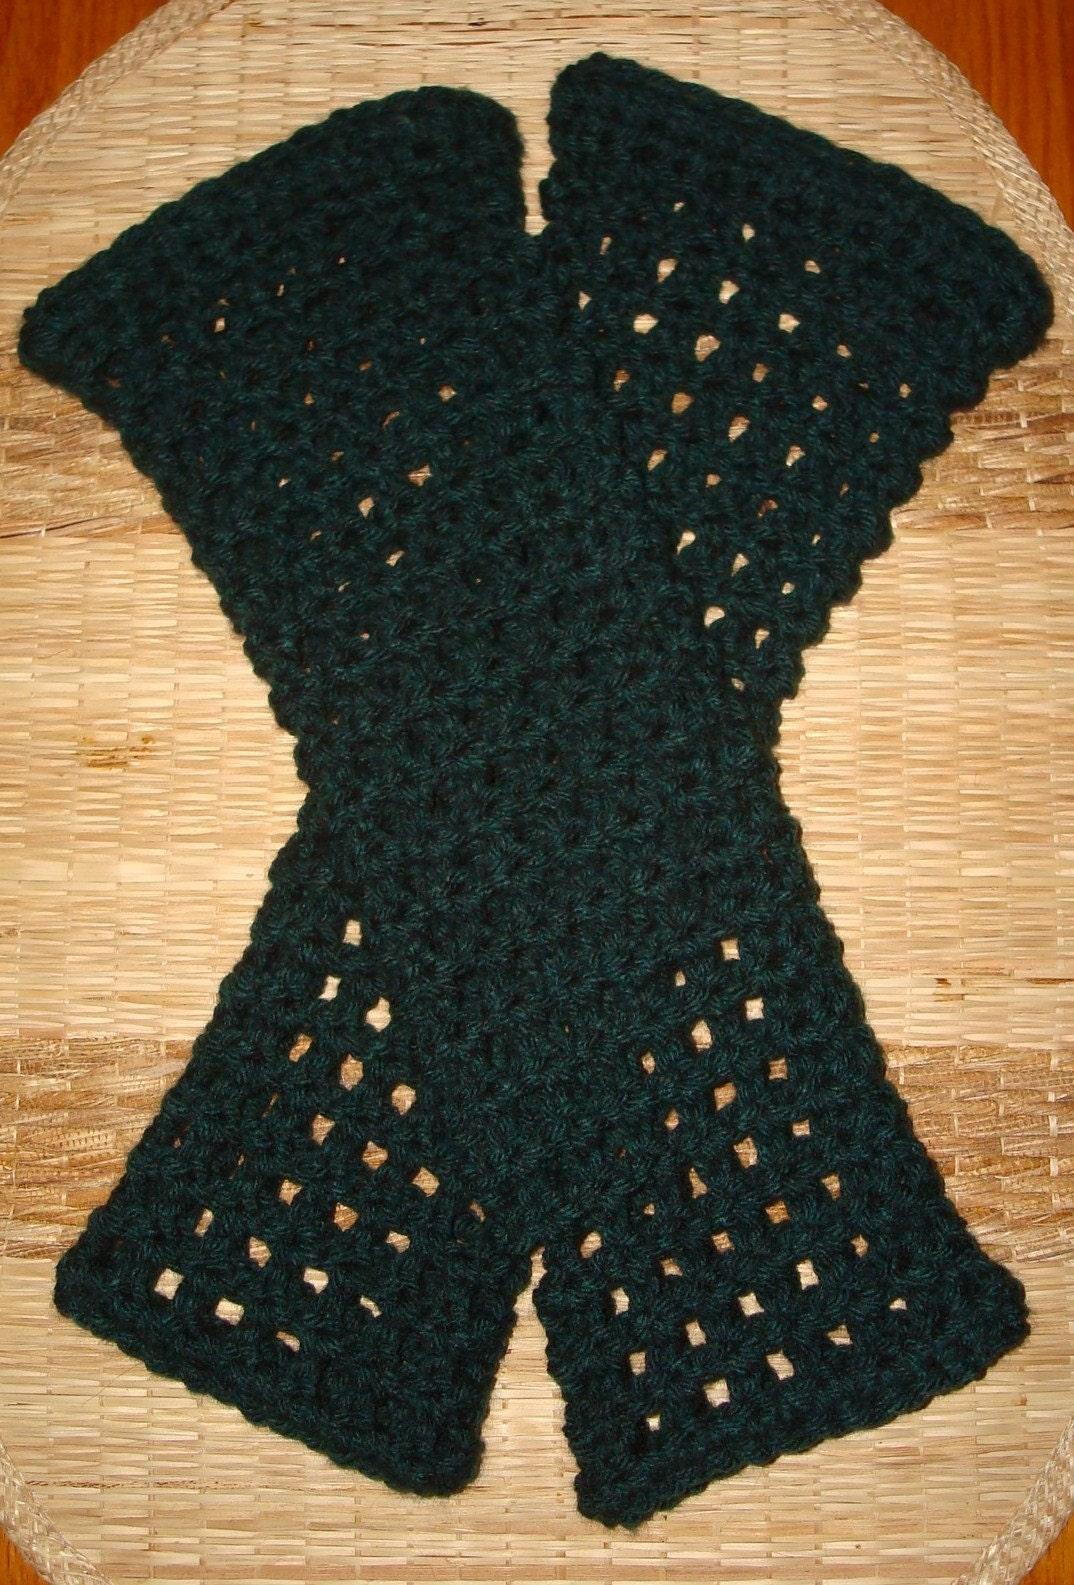 Crochet-Granny Square Scarf | FaveCrafts.com